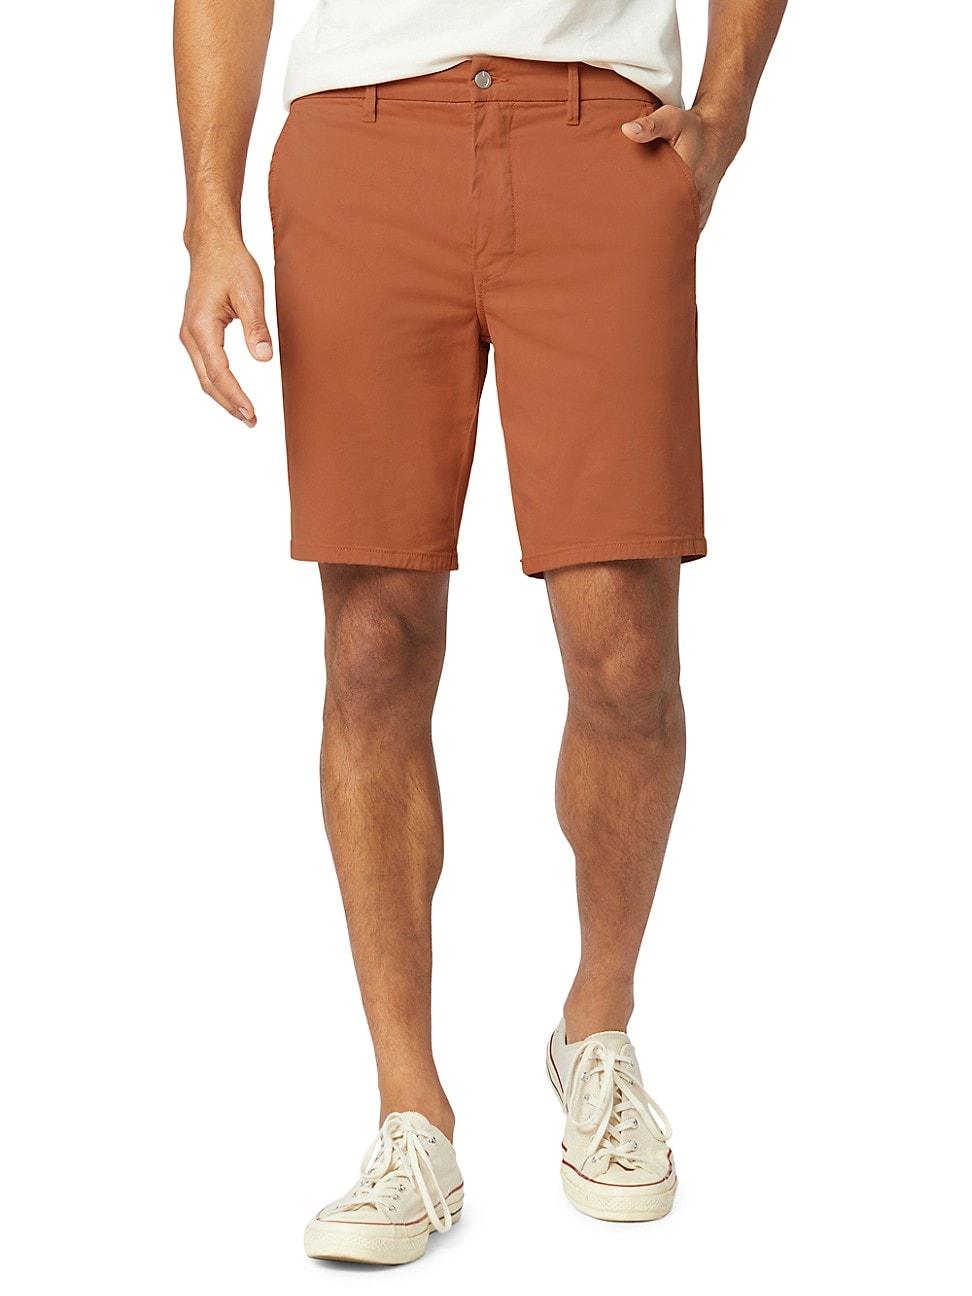 Joe's Jeans Shorts MEN'S REGULAR-FIT BRIXTON SHORTS